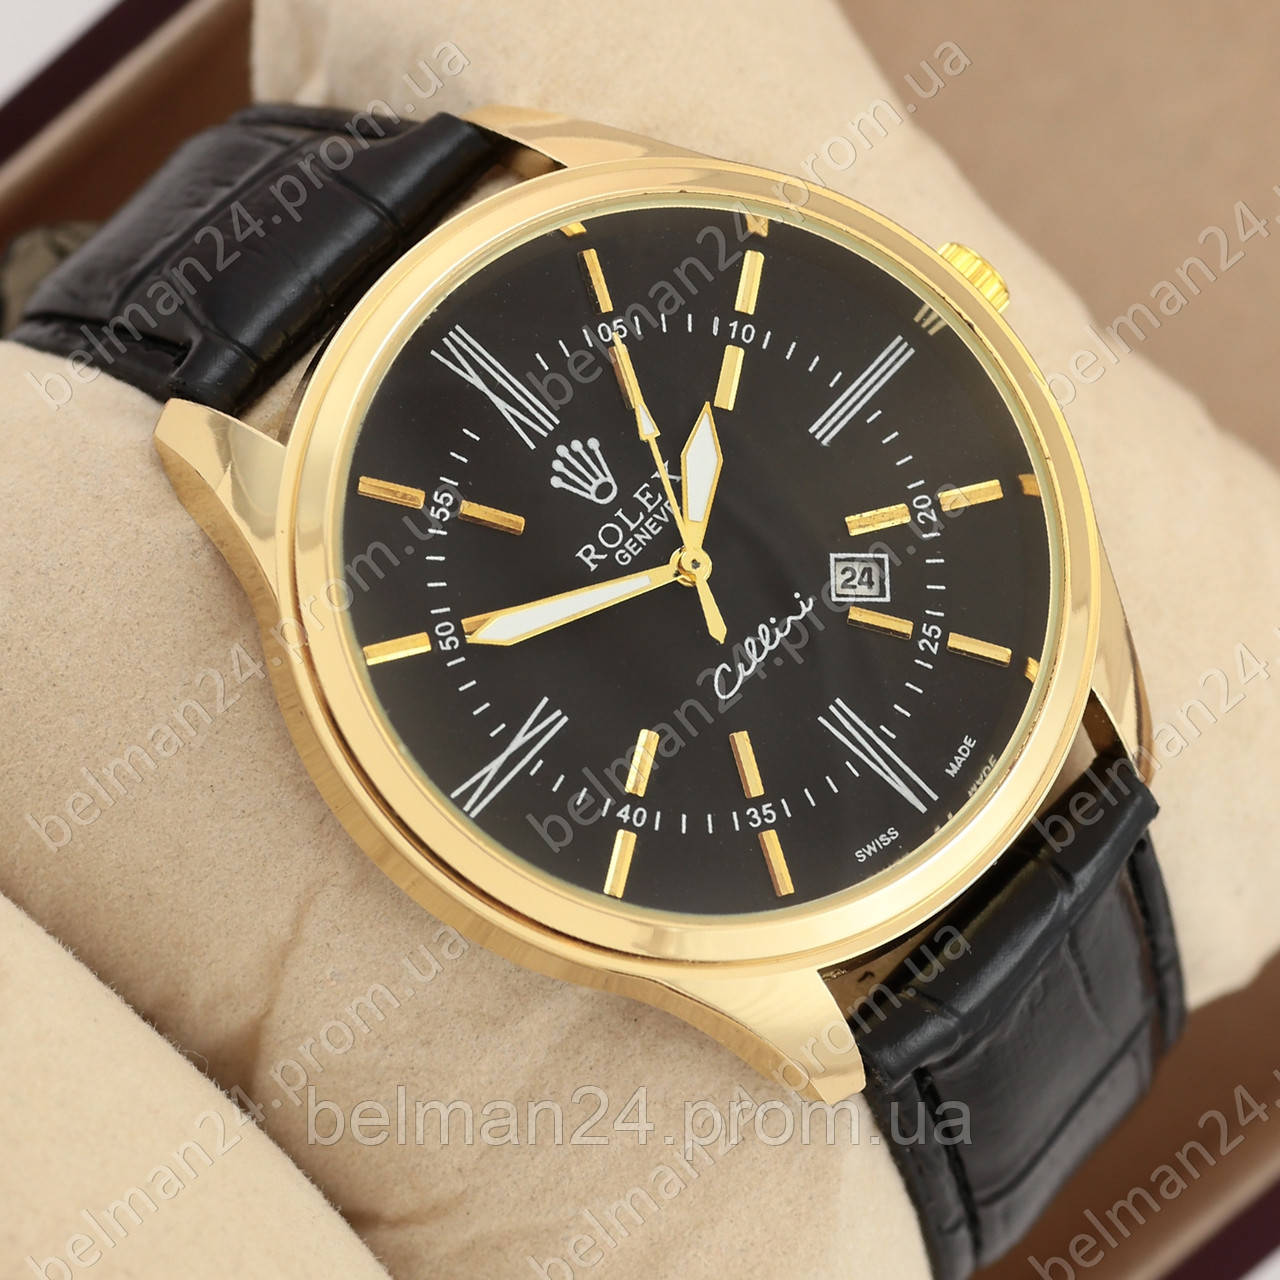 c16fb4be7225 Мужские наручные часы Rolex Black Gold Black  продажа, цена в ...